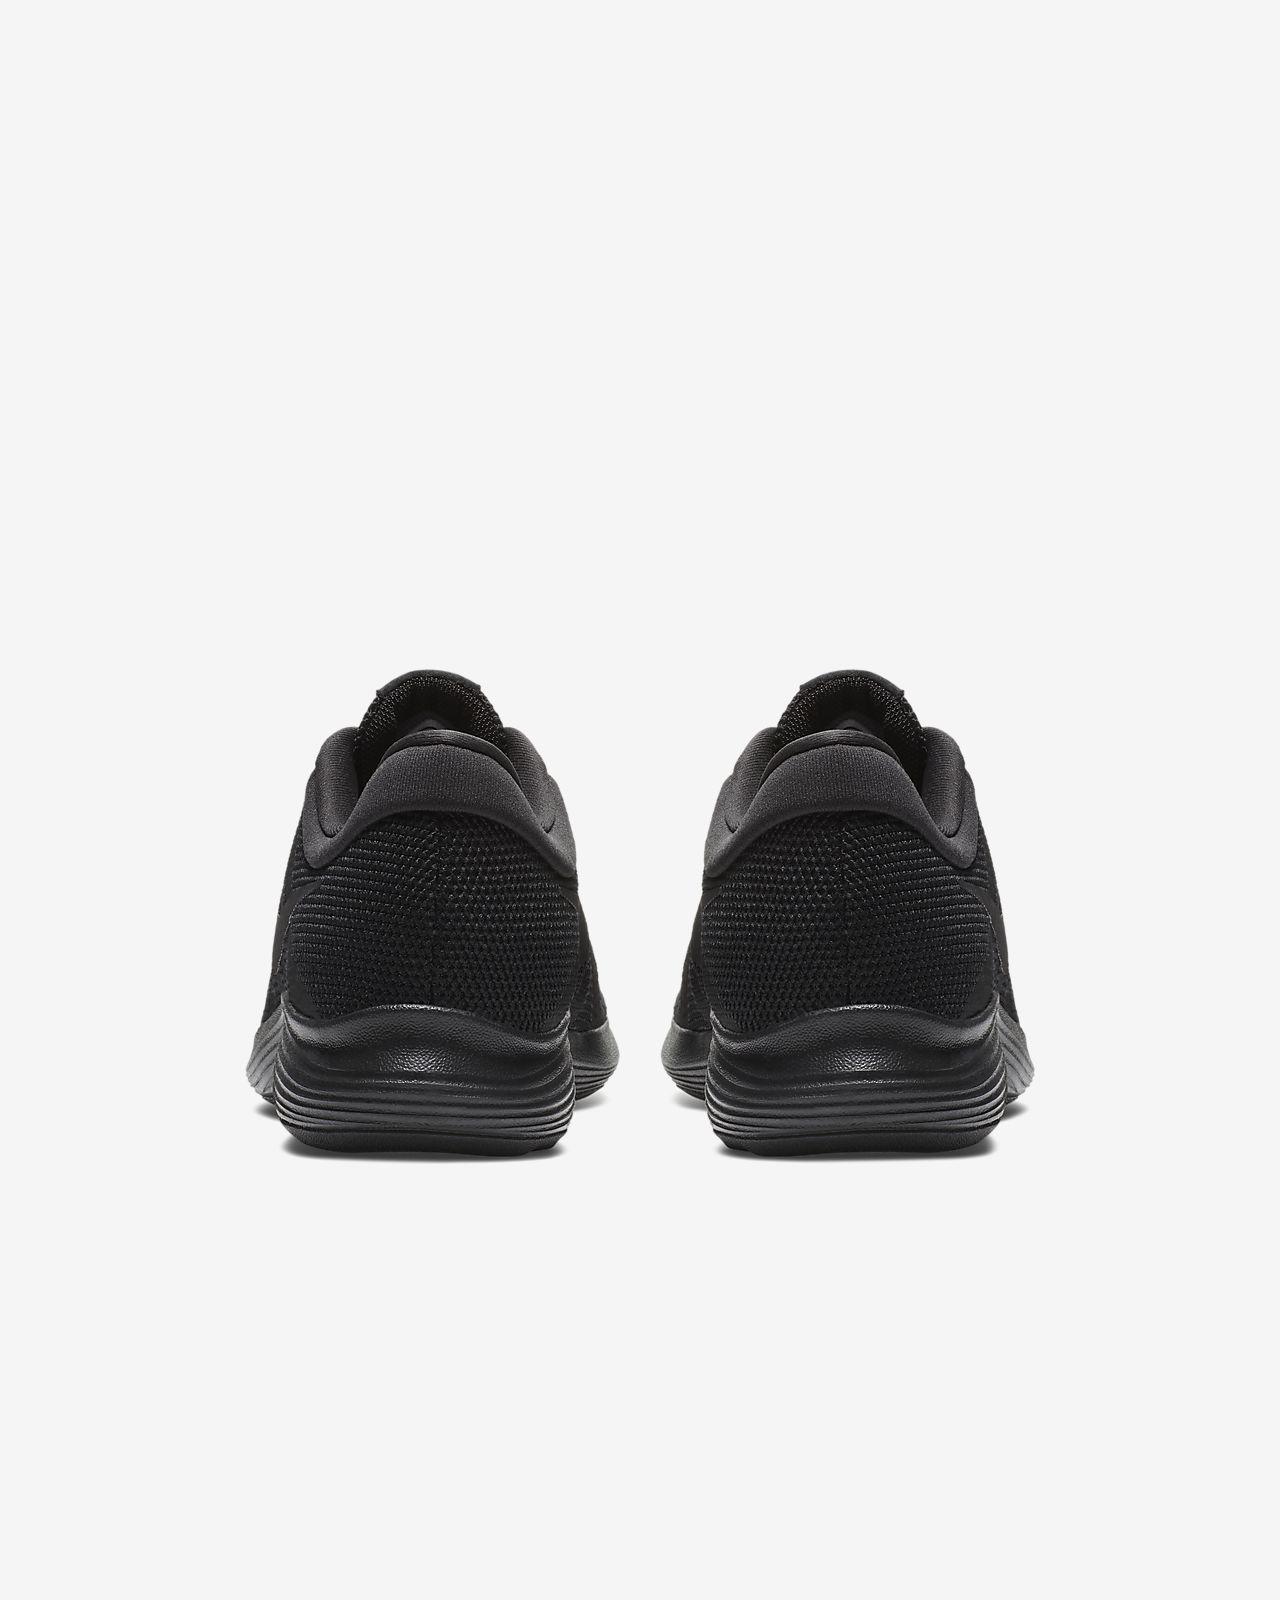 691b36fcc6ab Chaussure de running Nike Revolution 4 pour Homme (EU). Nike.com BE